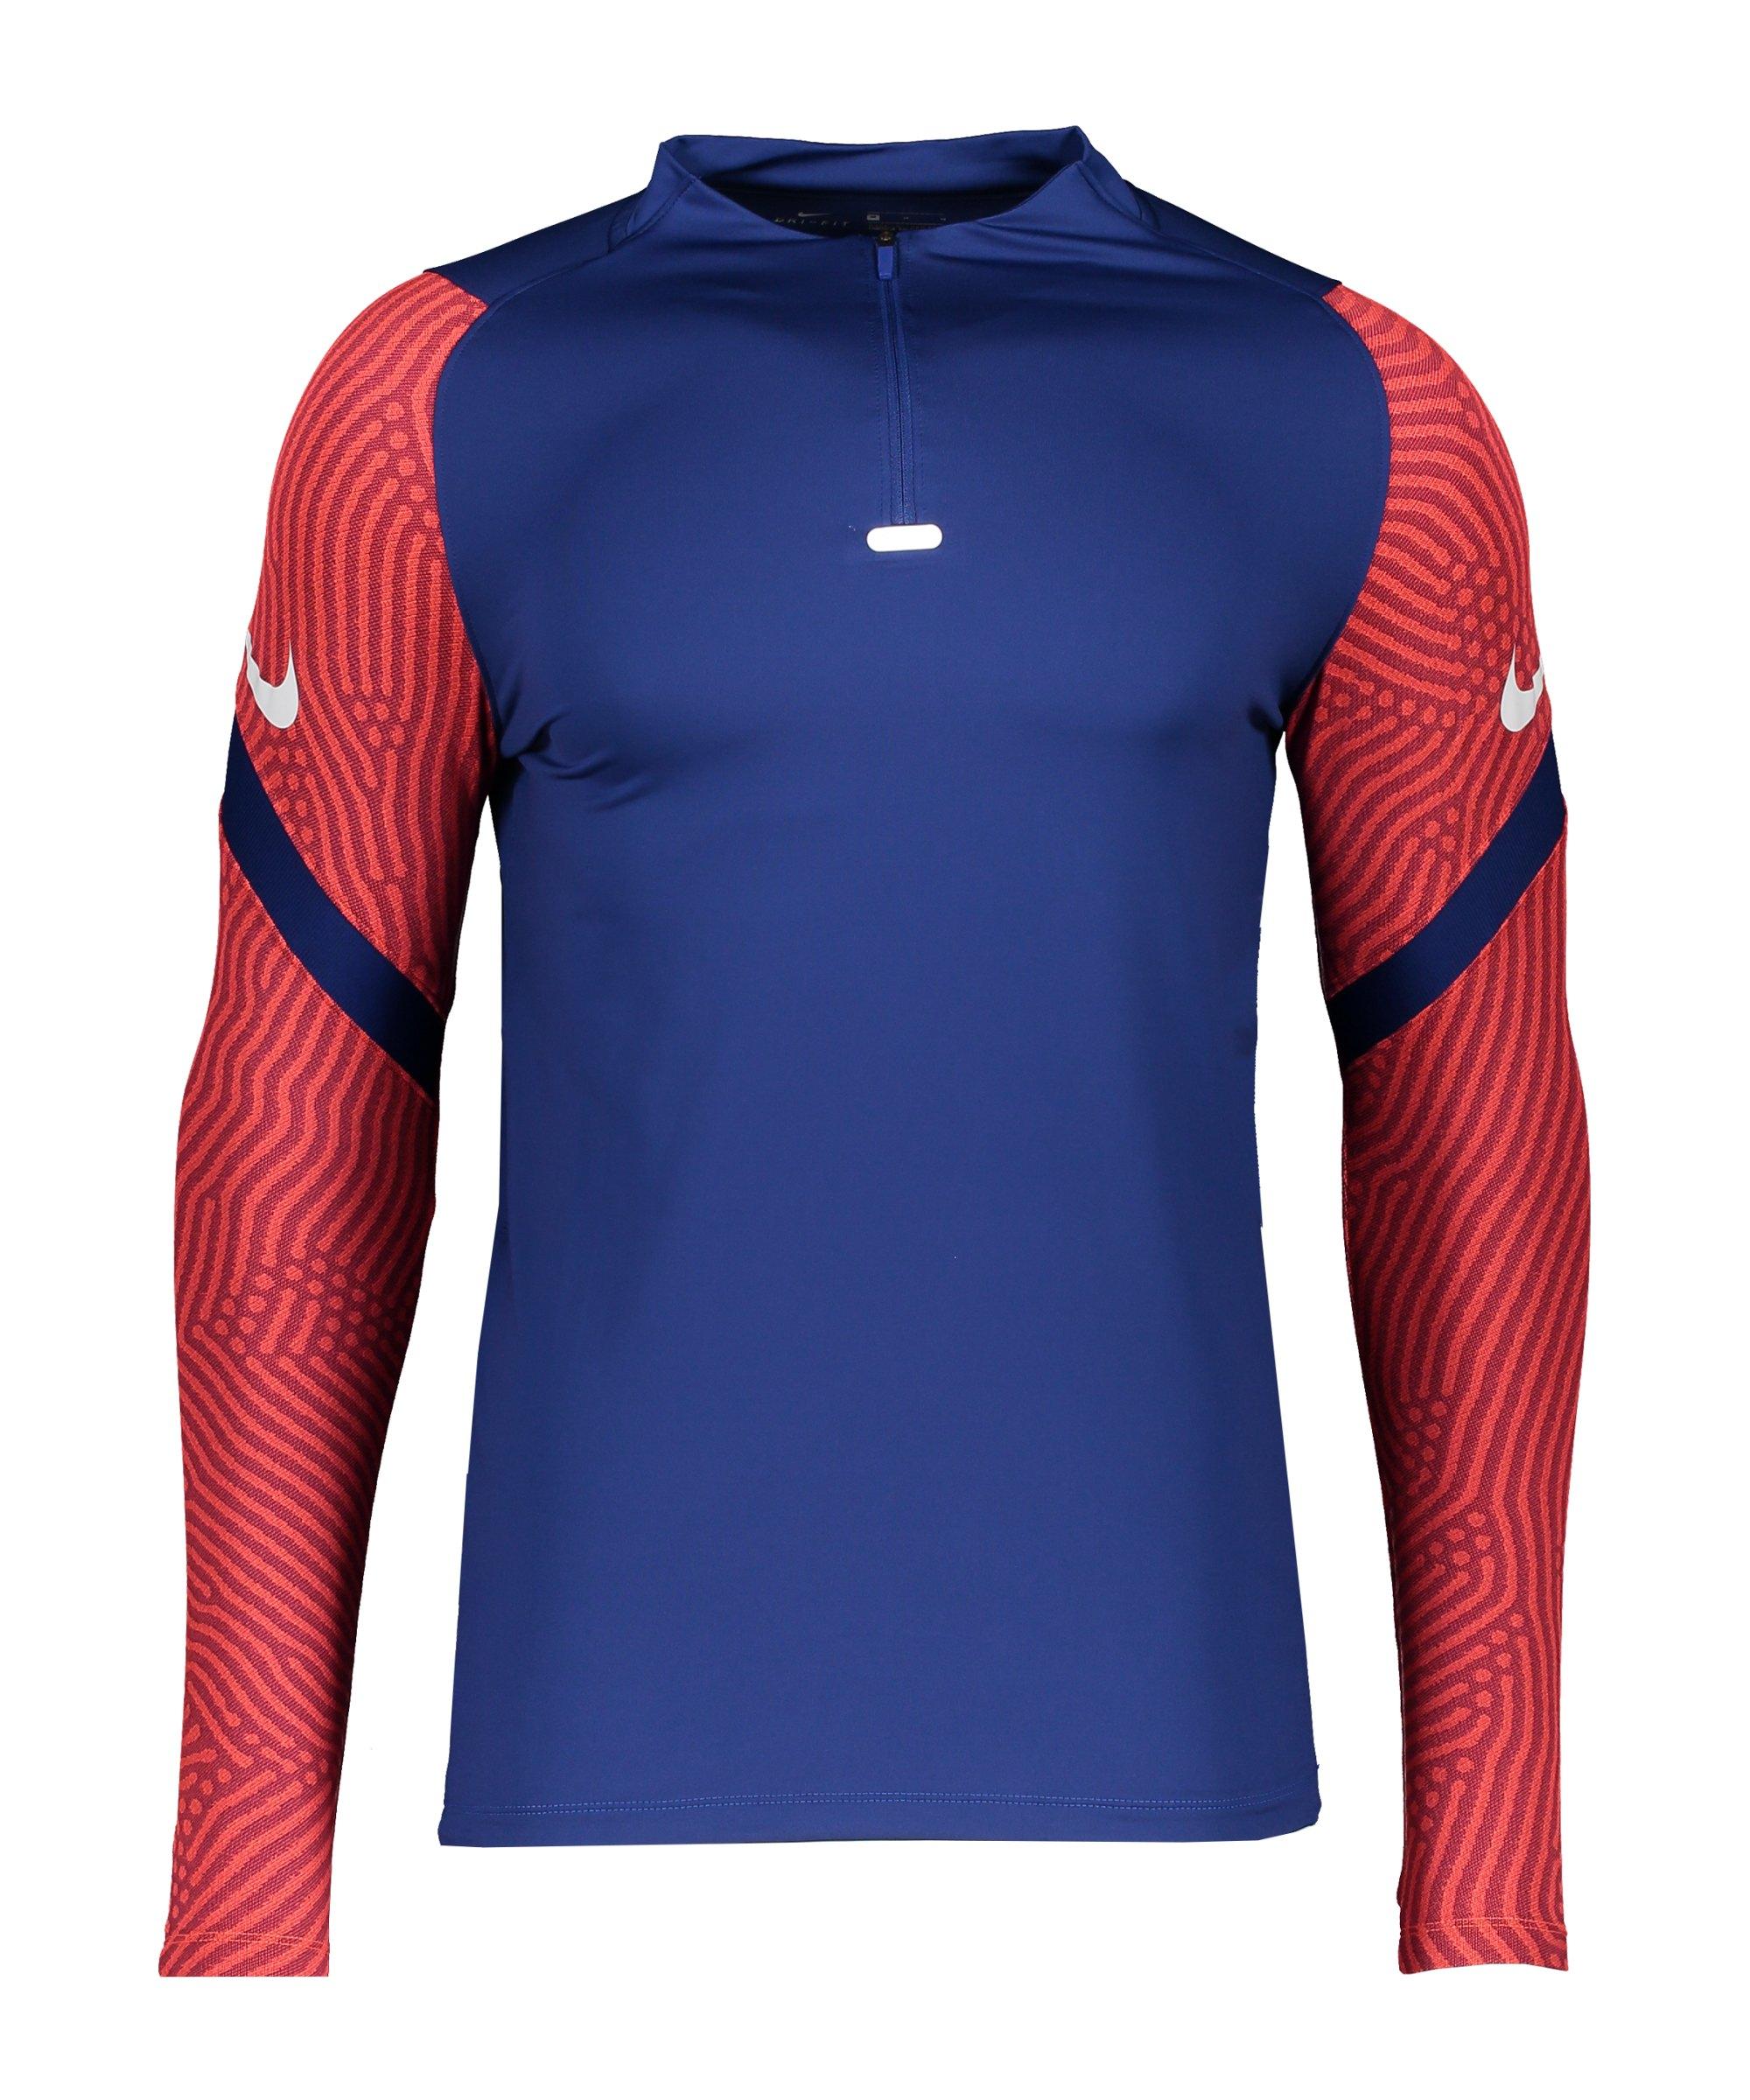 Nike Strike 1/4 Zip Sweatshirt Blau F455 - blau